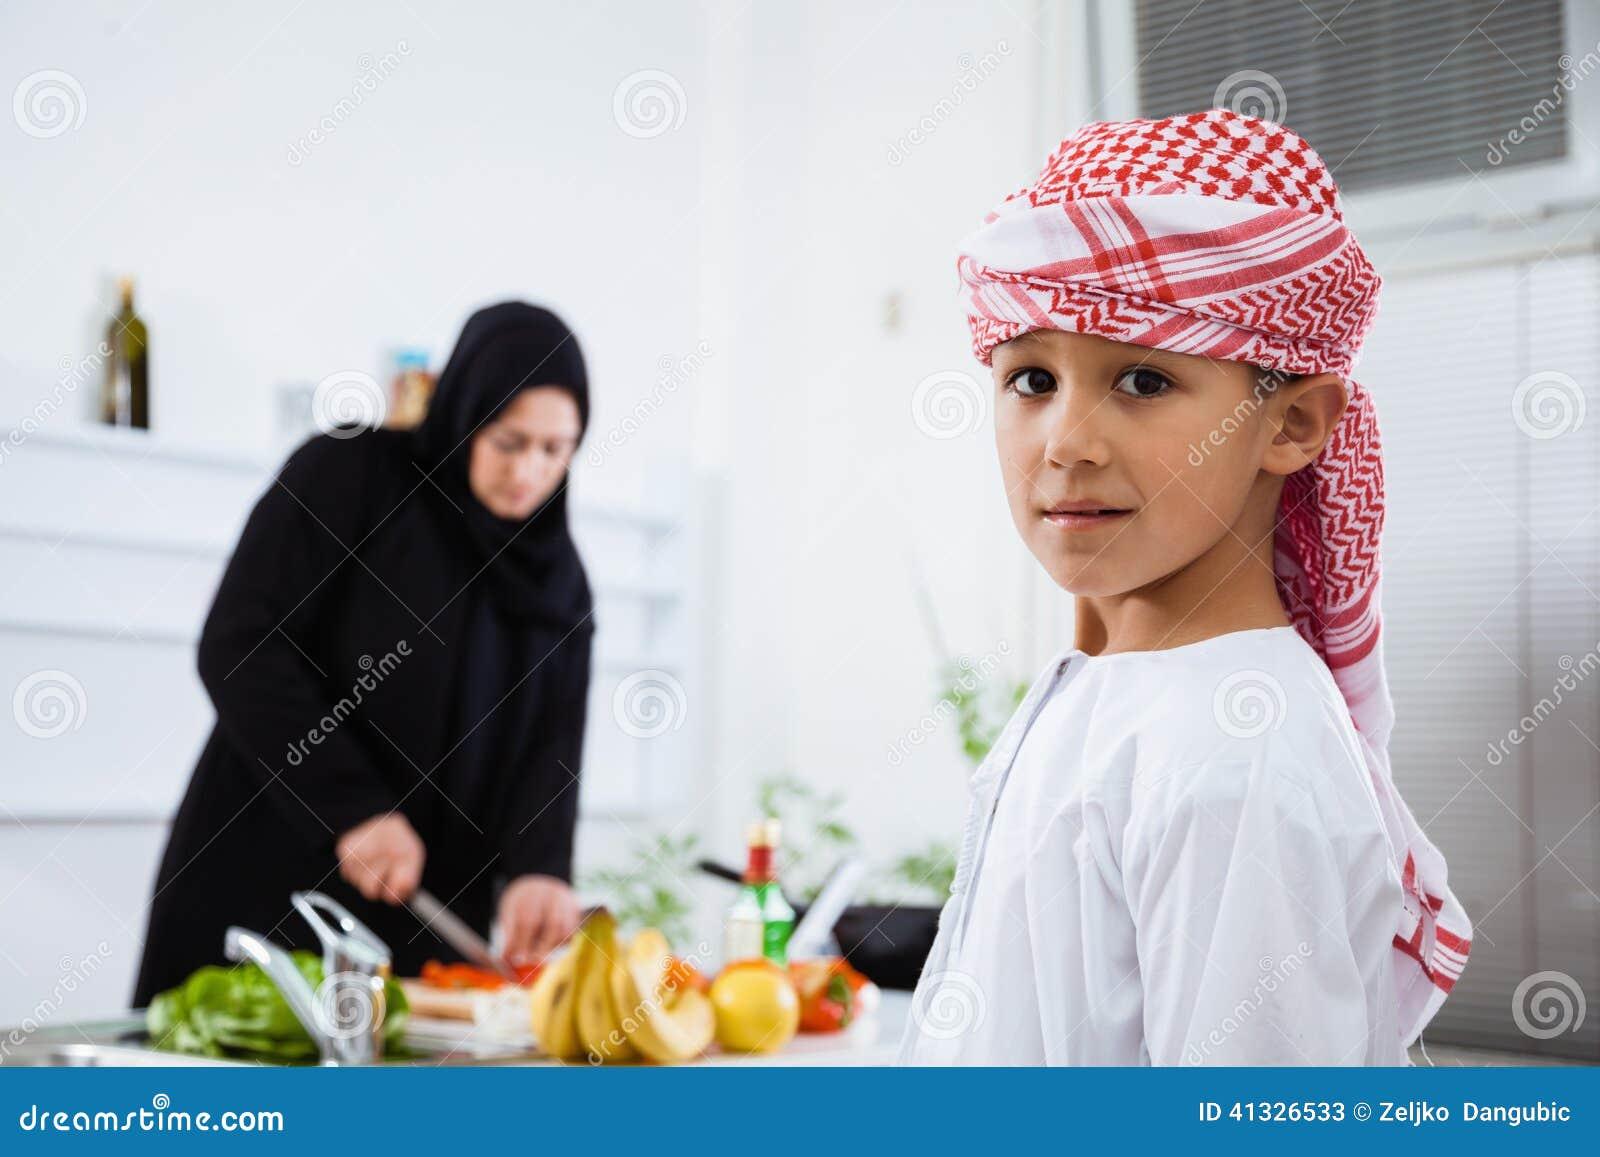 Арабская женщина на кухне видео фото 569-548